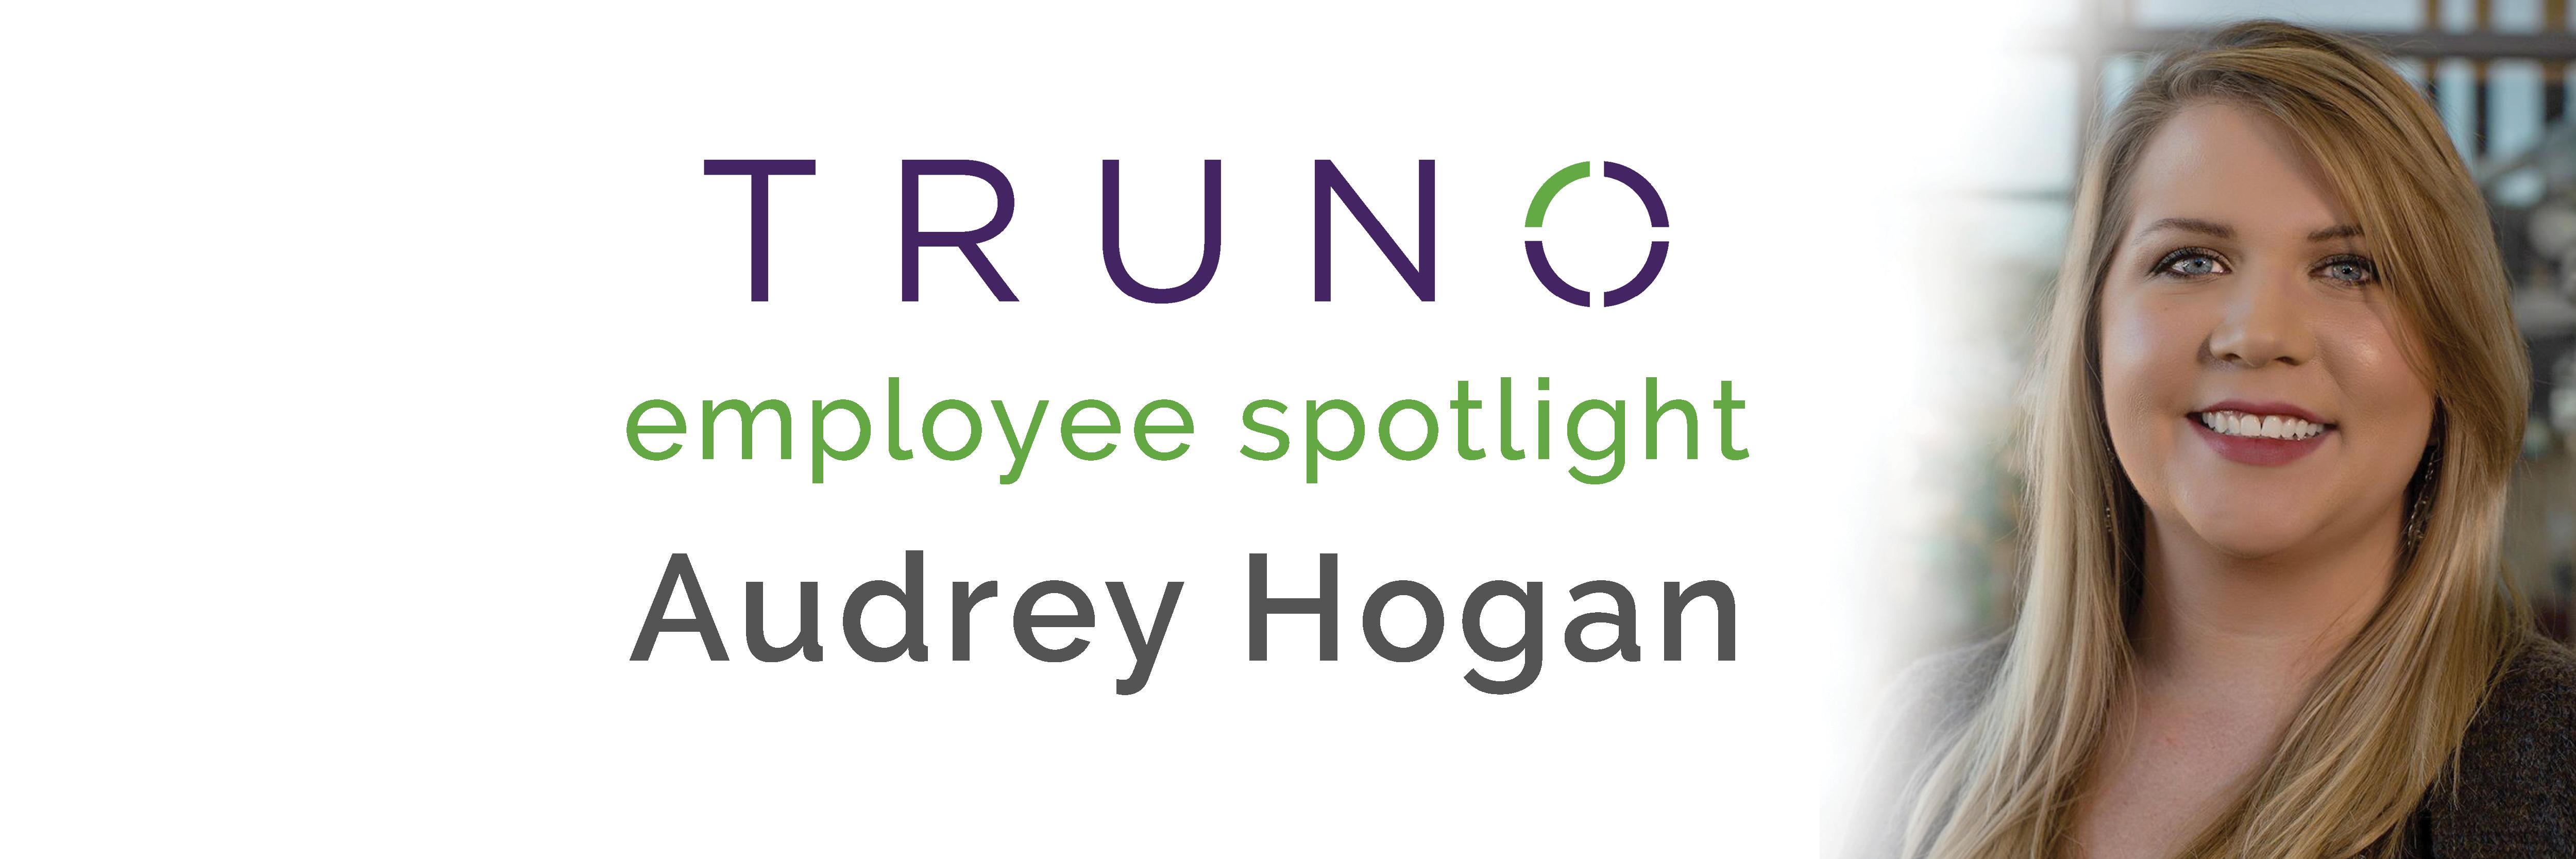 Employee Spotlight - Audrey